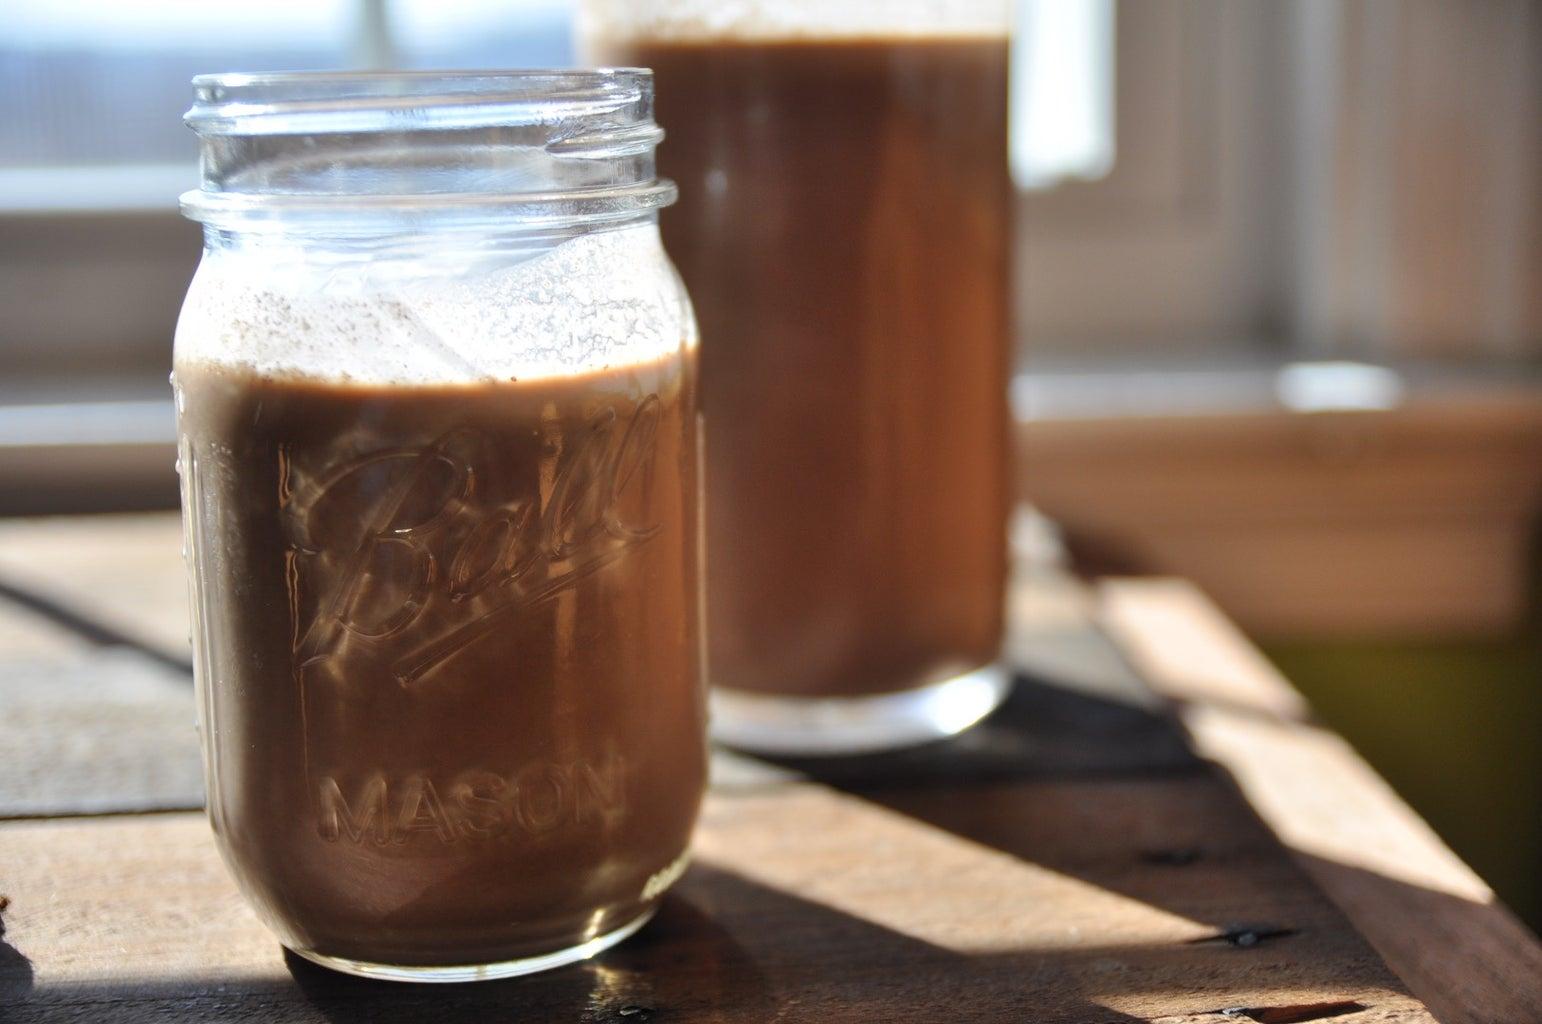 How to Make Chocolate Hazelnut Milk   Drinkable Nutella